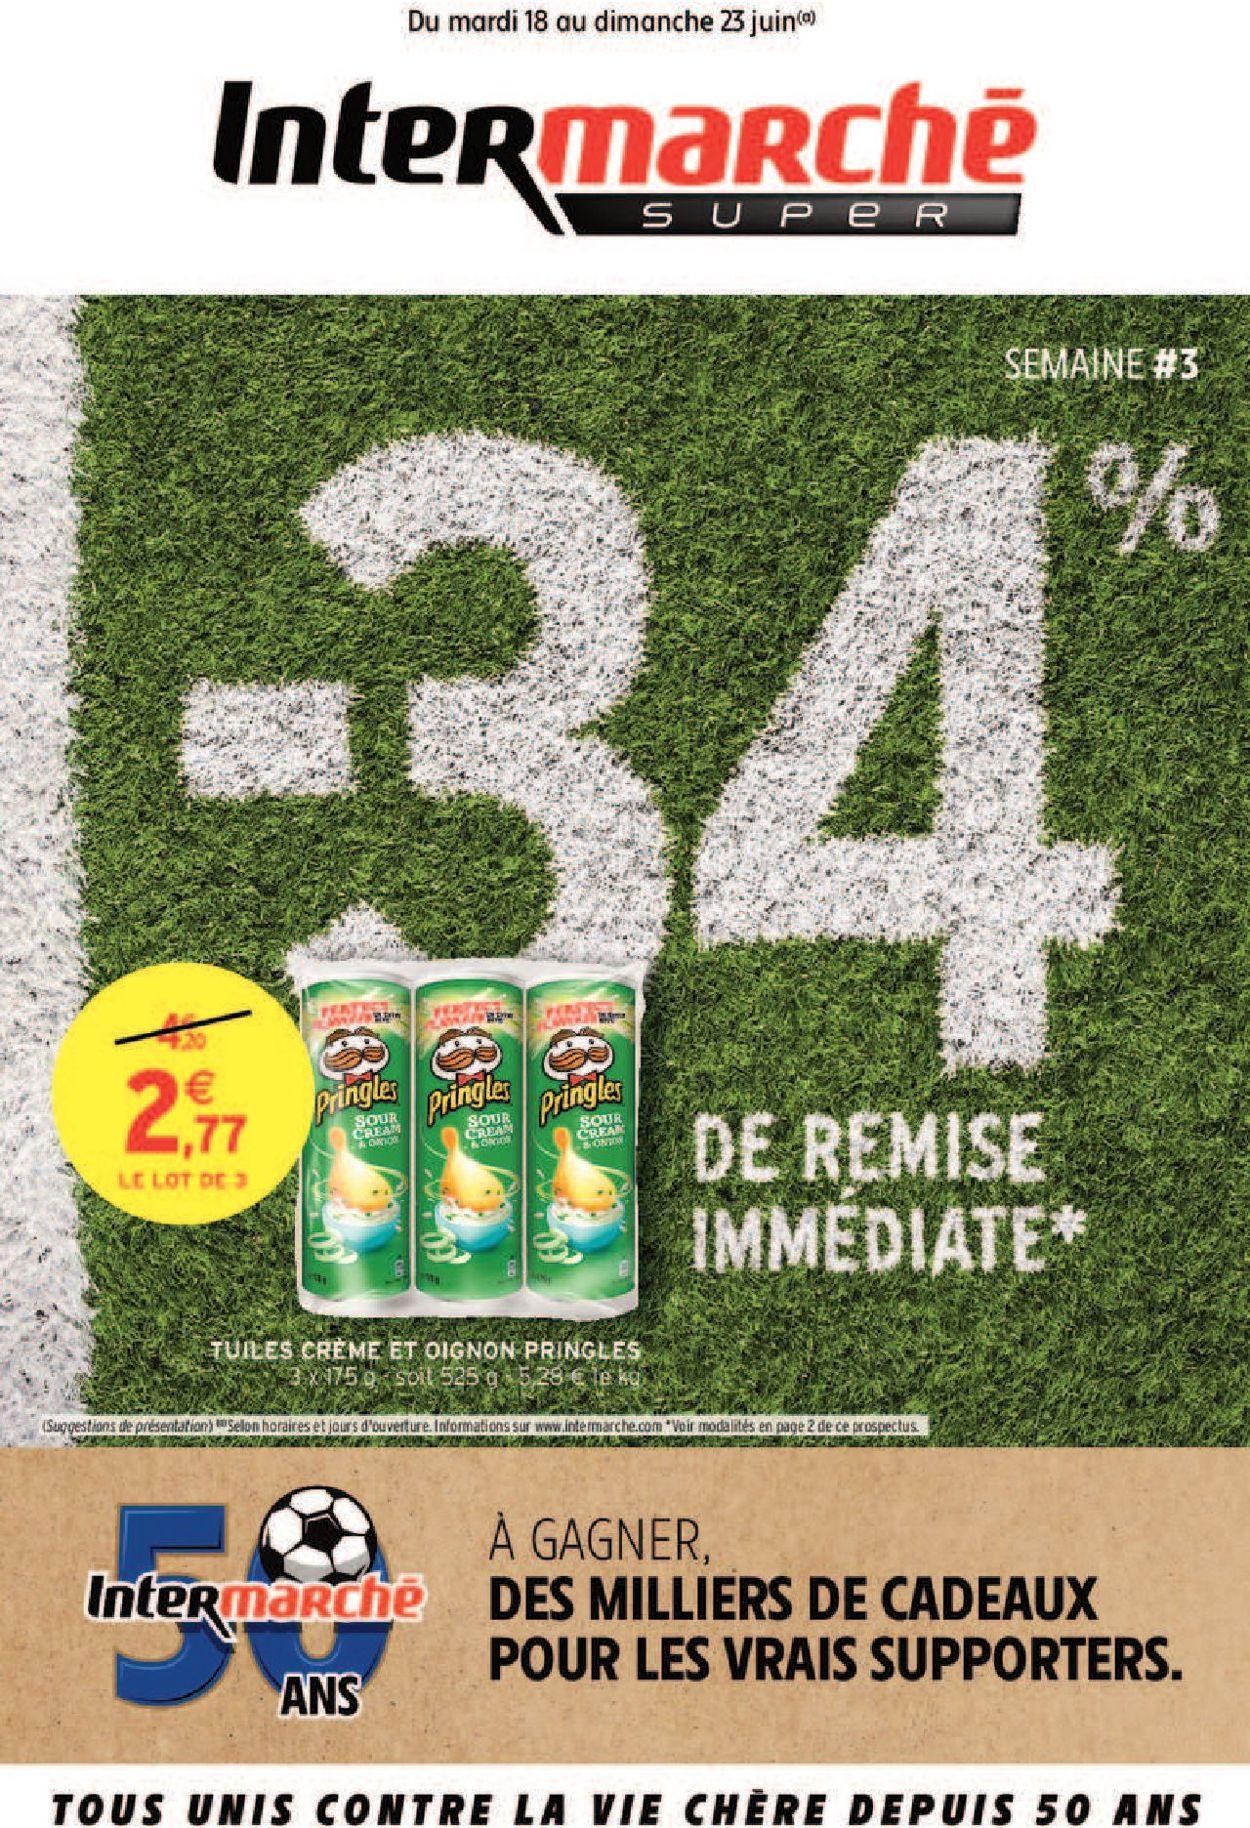 Intermarché Catalogue - 18.06-23.06.2019